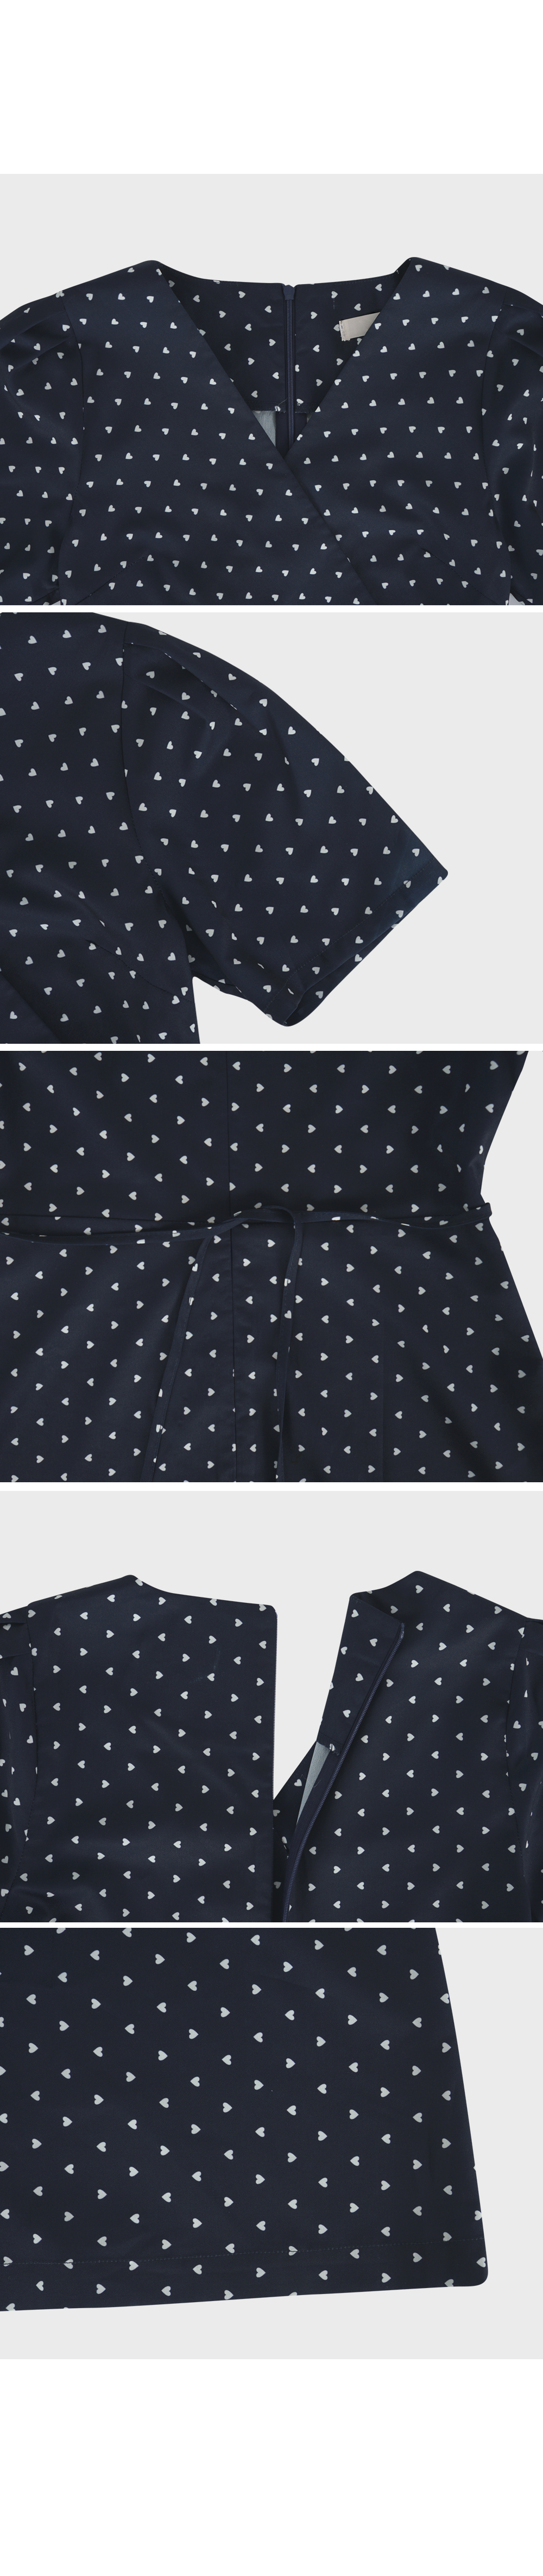 Navy Heart Printed Mini Dress- Holiholic